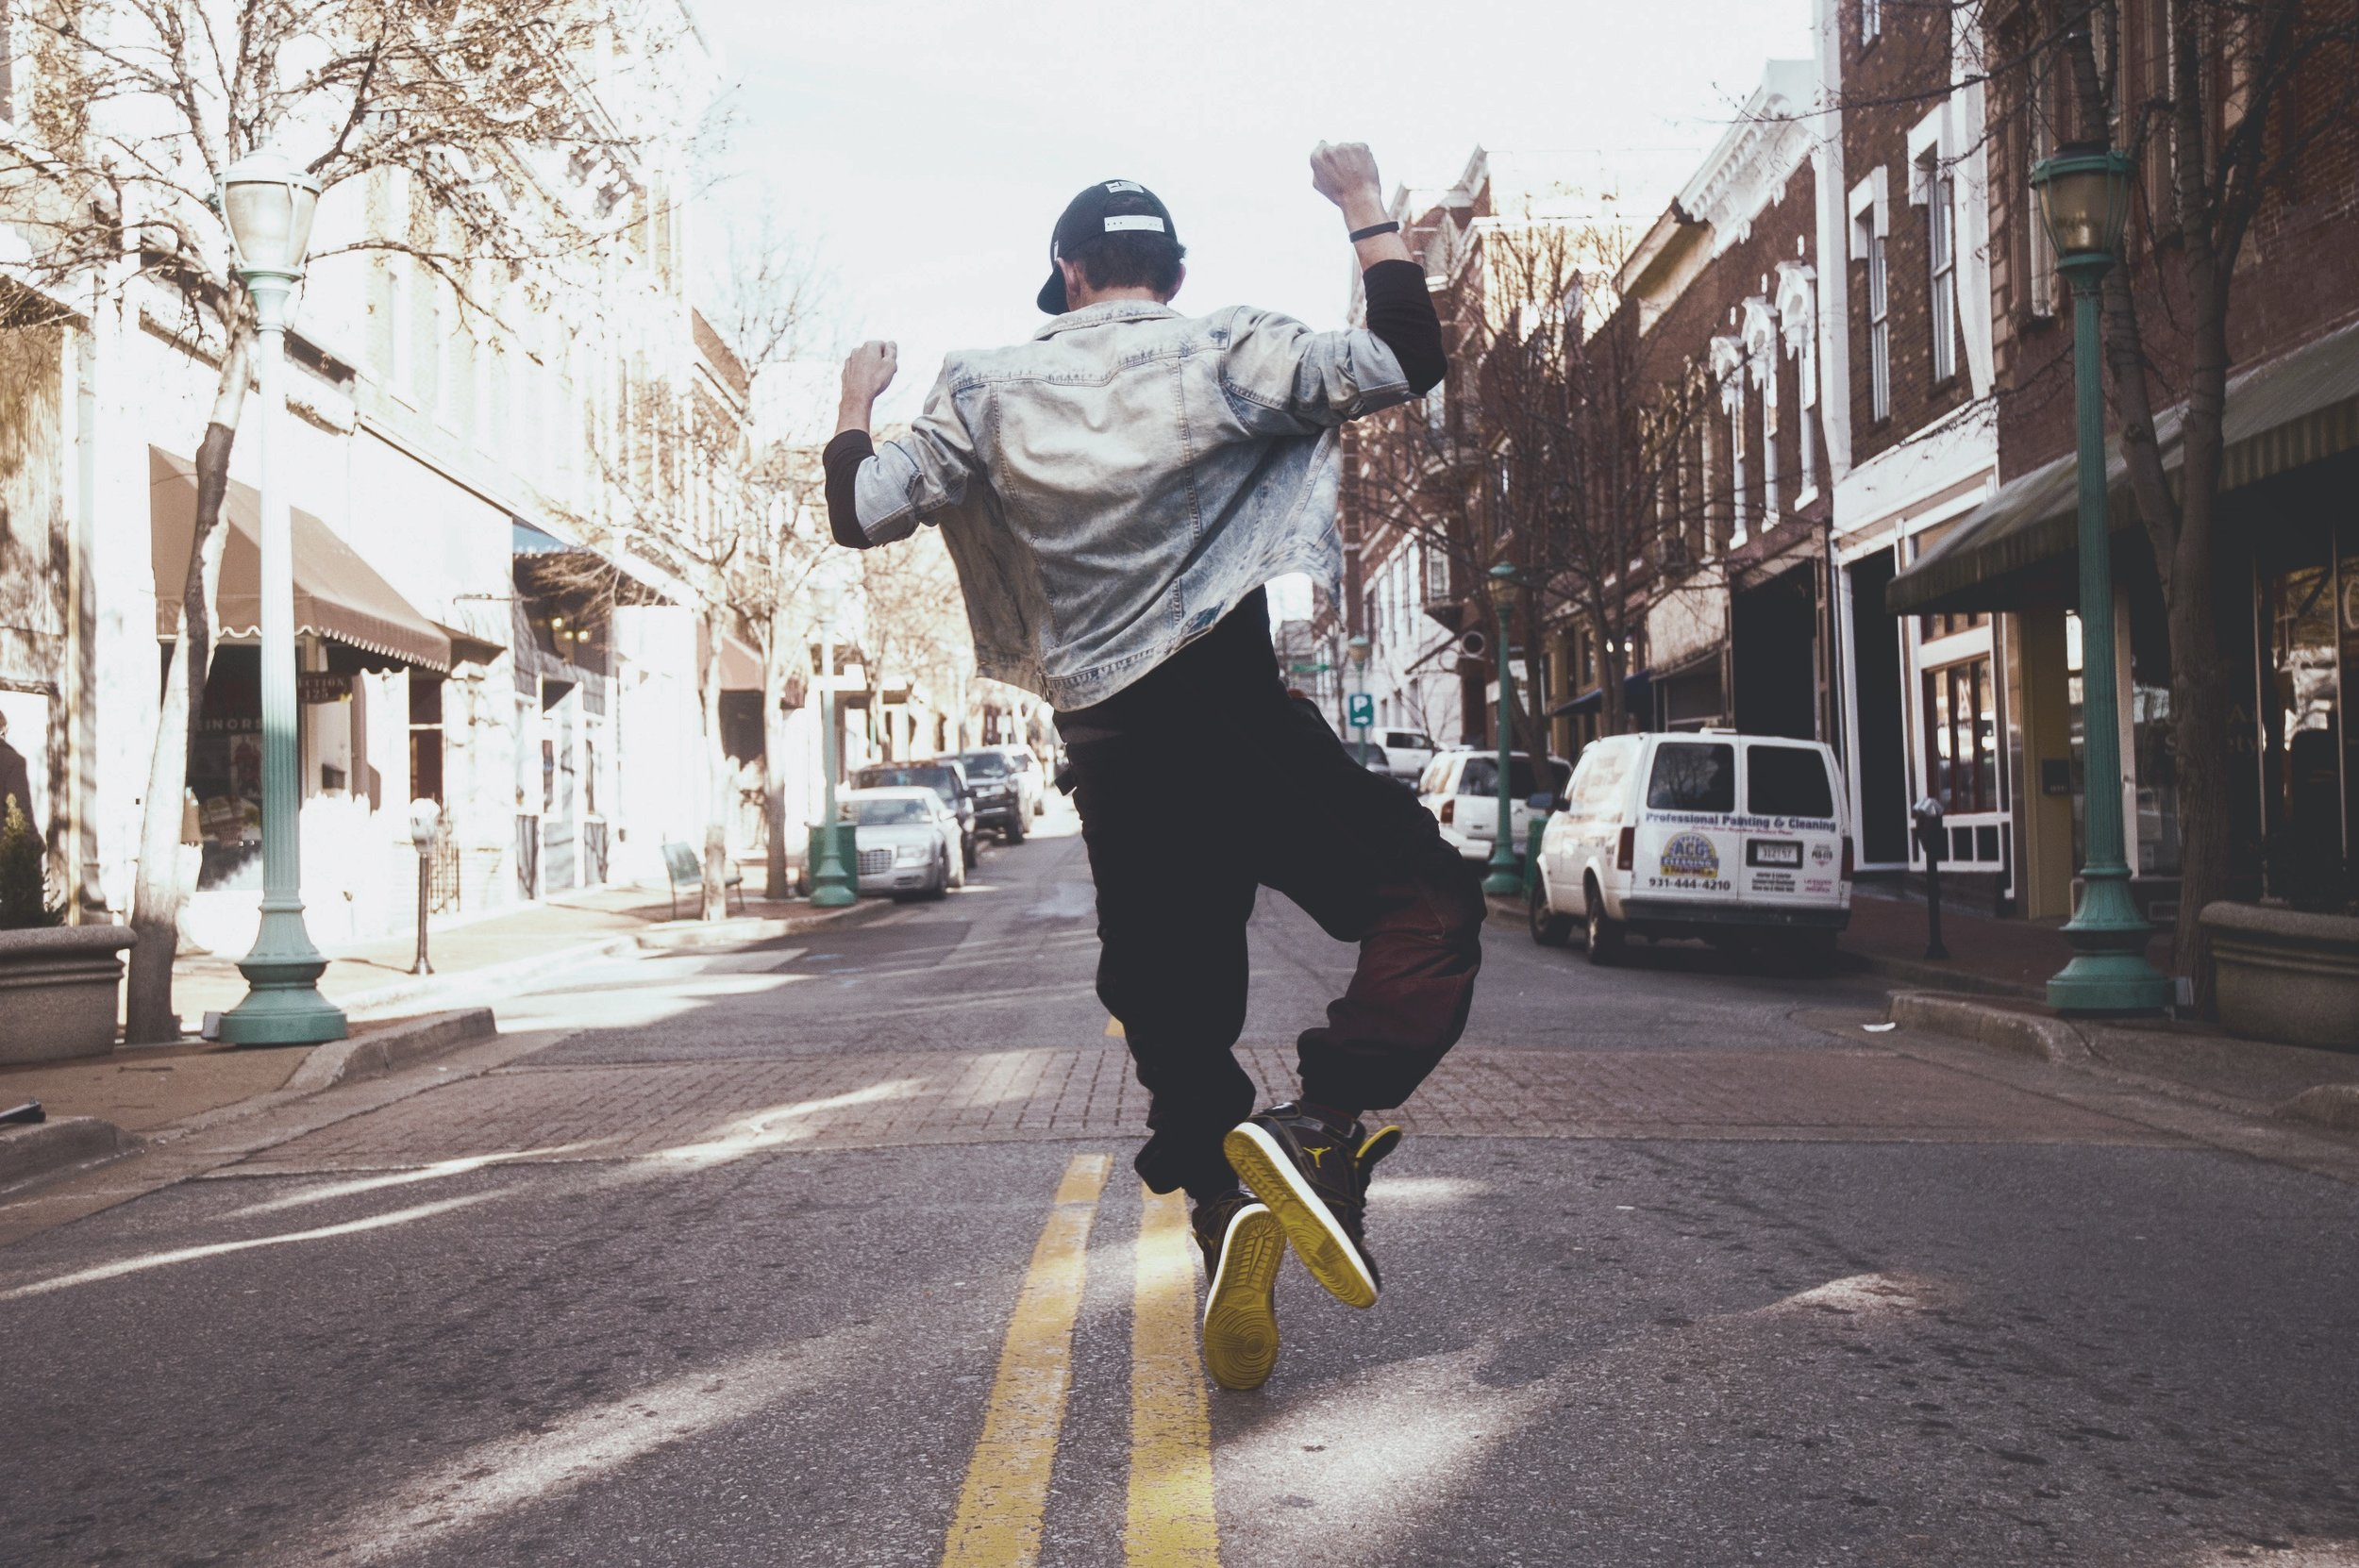 guy jumping.jpg